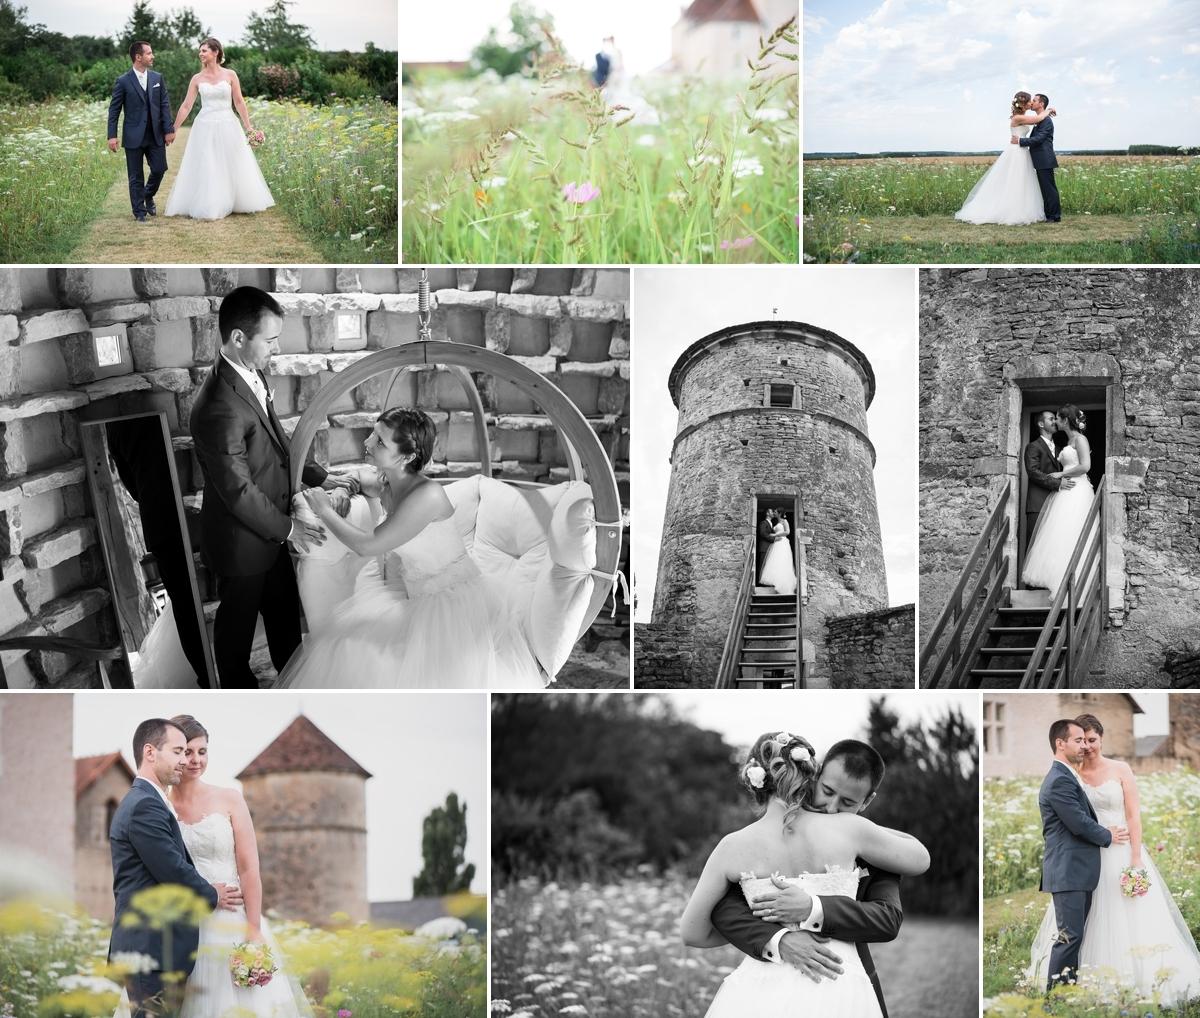 seance-couple-mariage-manoir-equivocal-claudine-nicolas